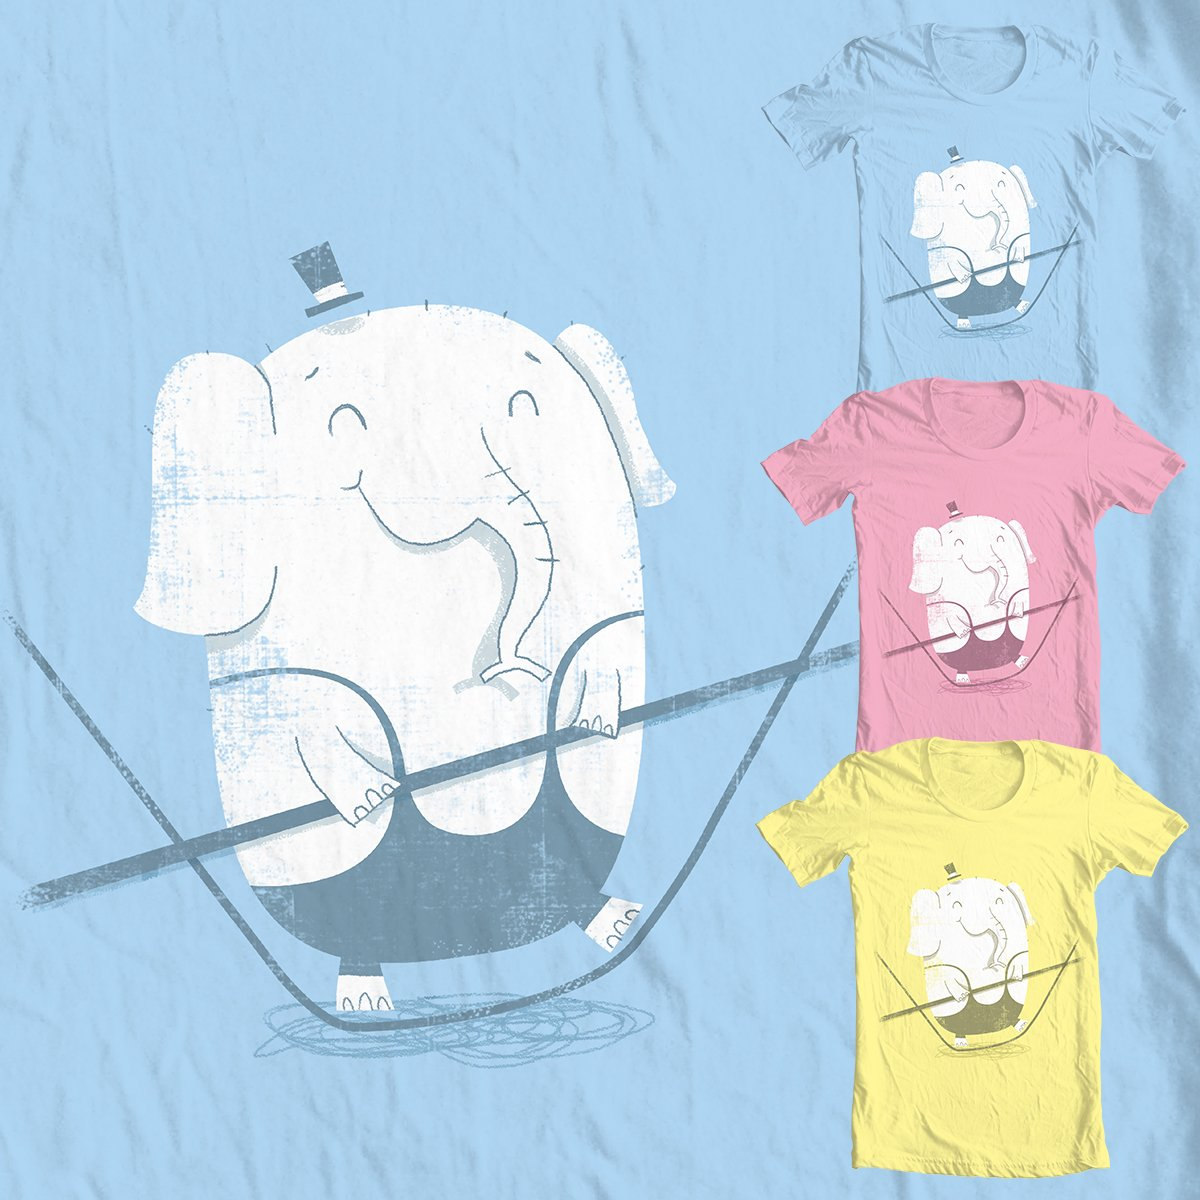 Tightrope Elephant T-shirt Design